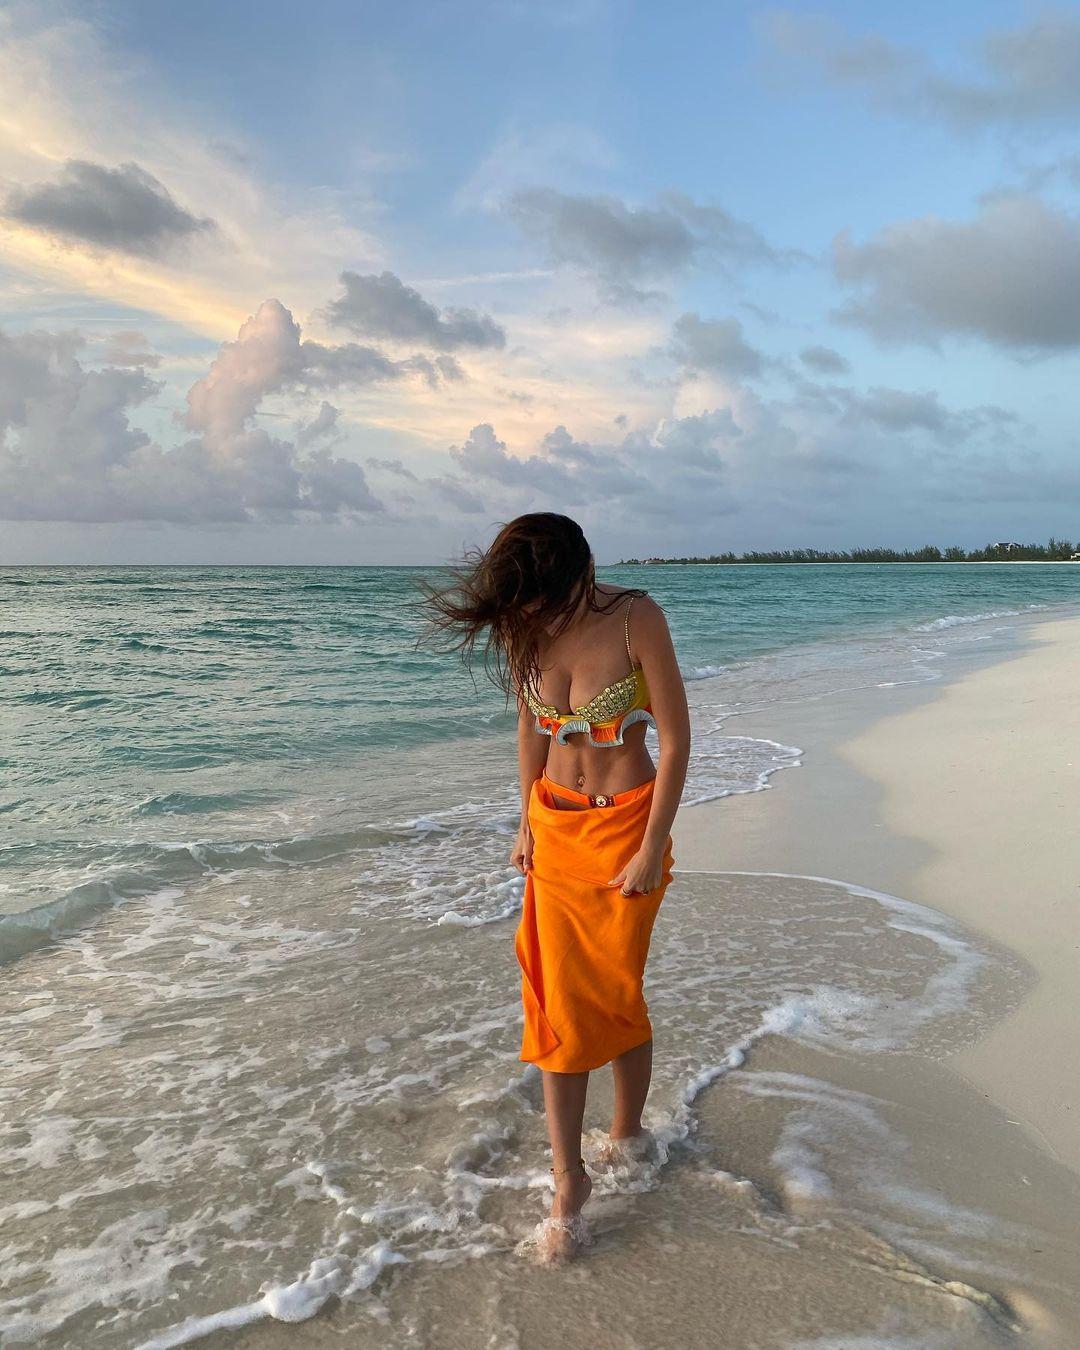 Emily Ratajkowski wearing a orange fitted skirt